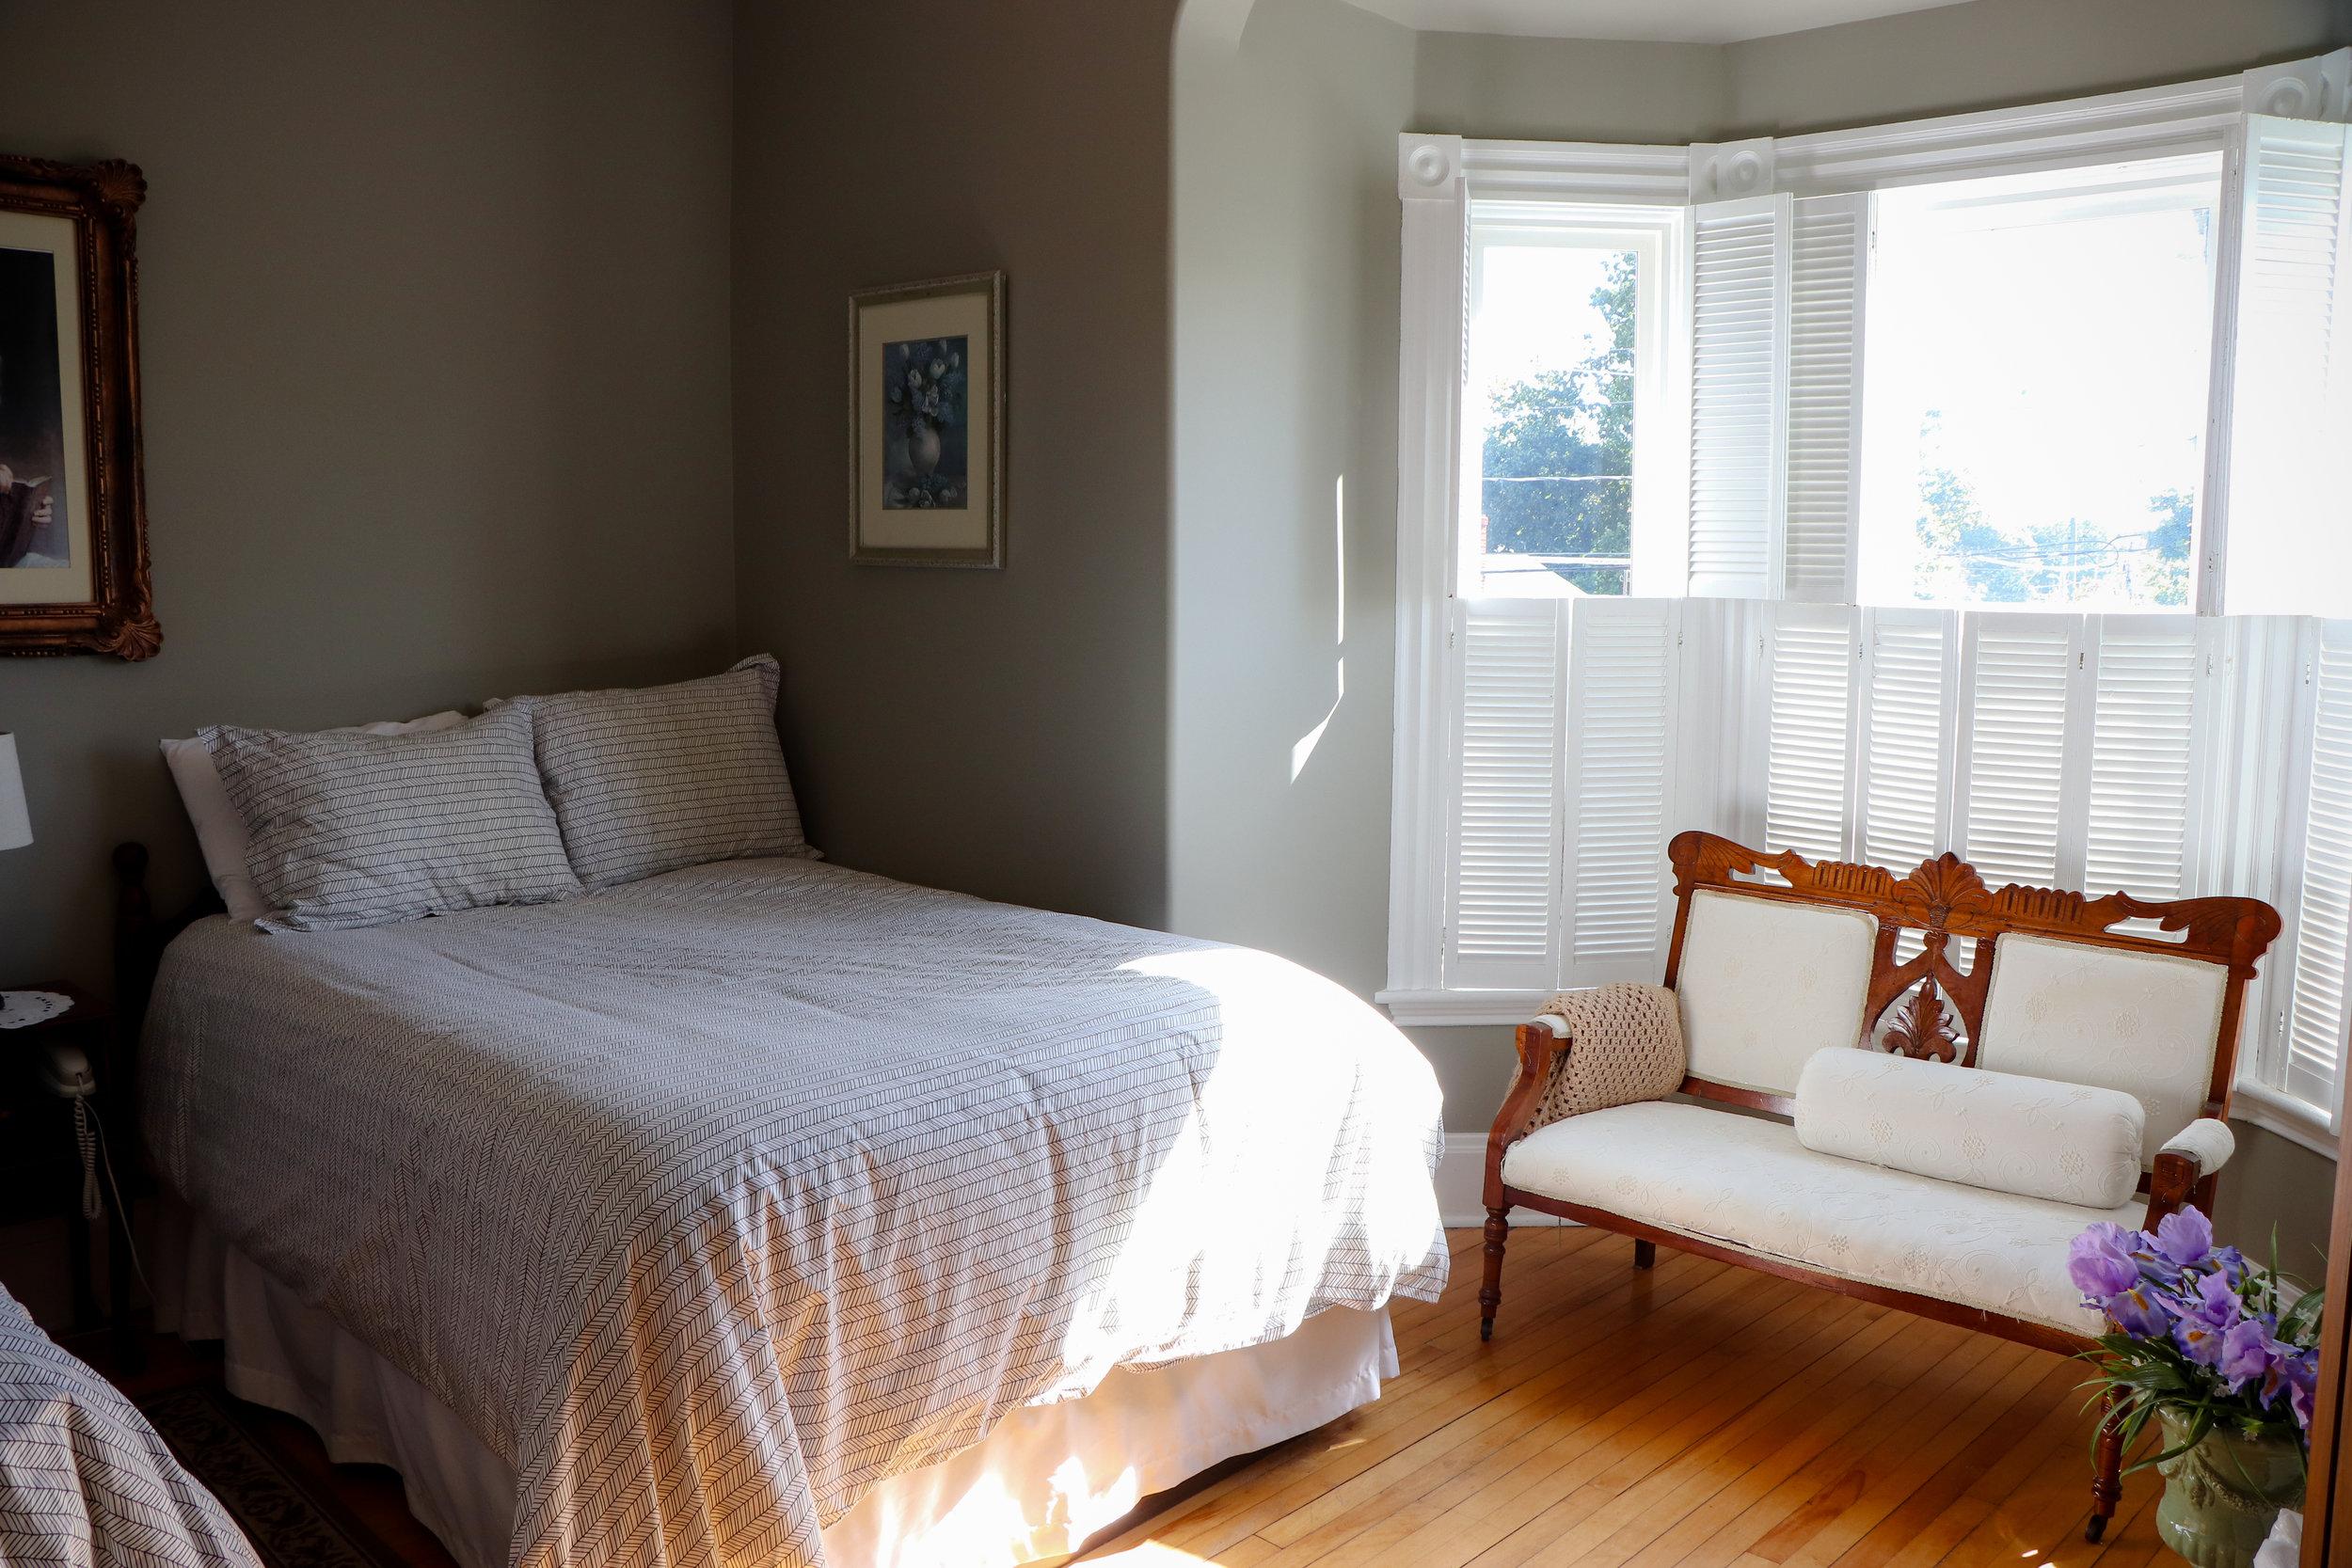 202 Greenwich Room - Price $161.00/Night